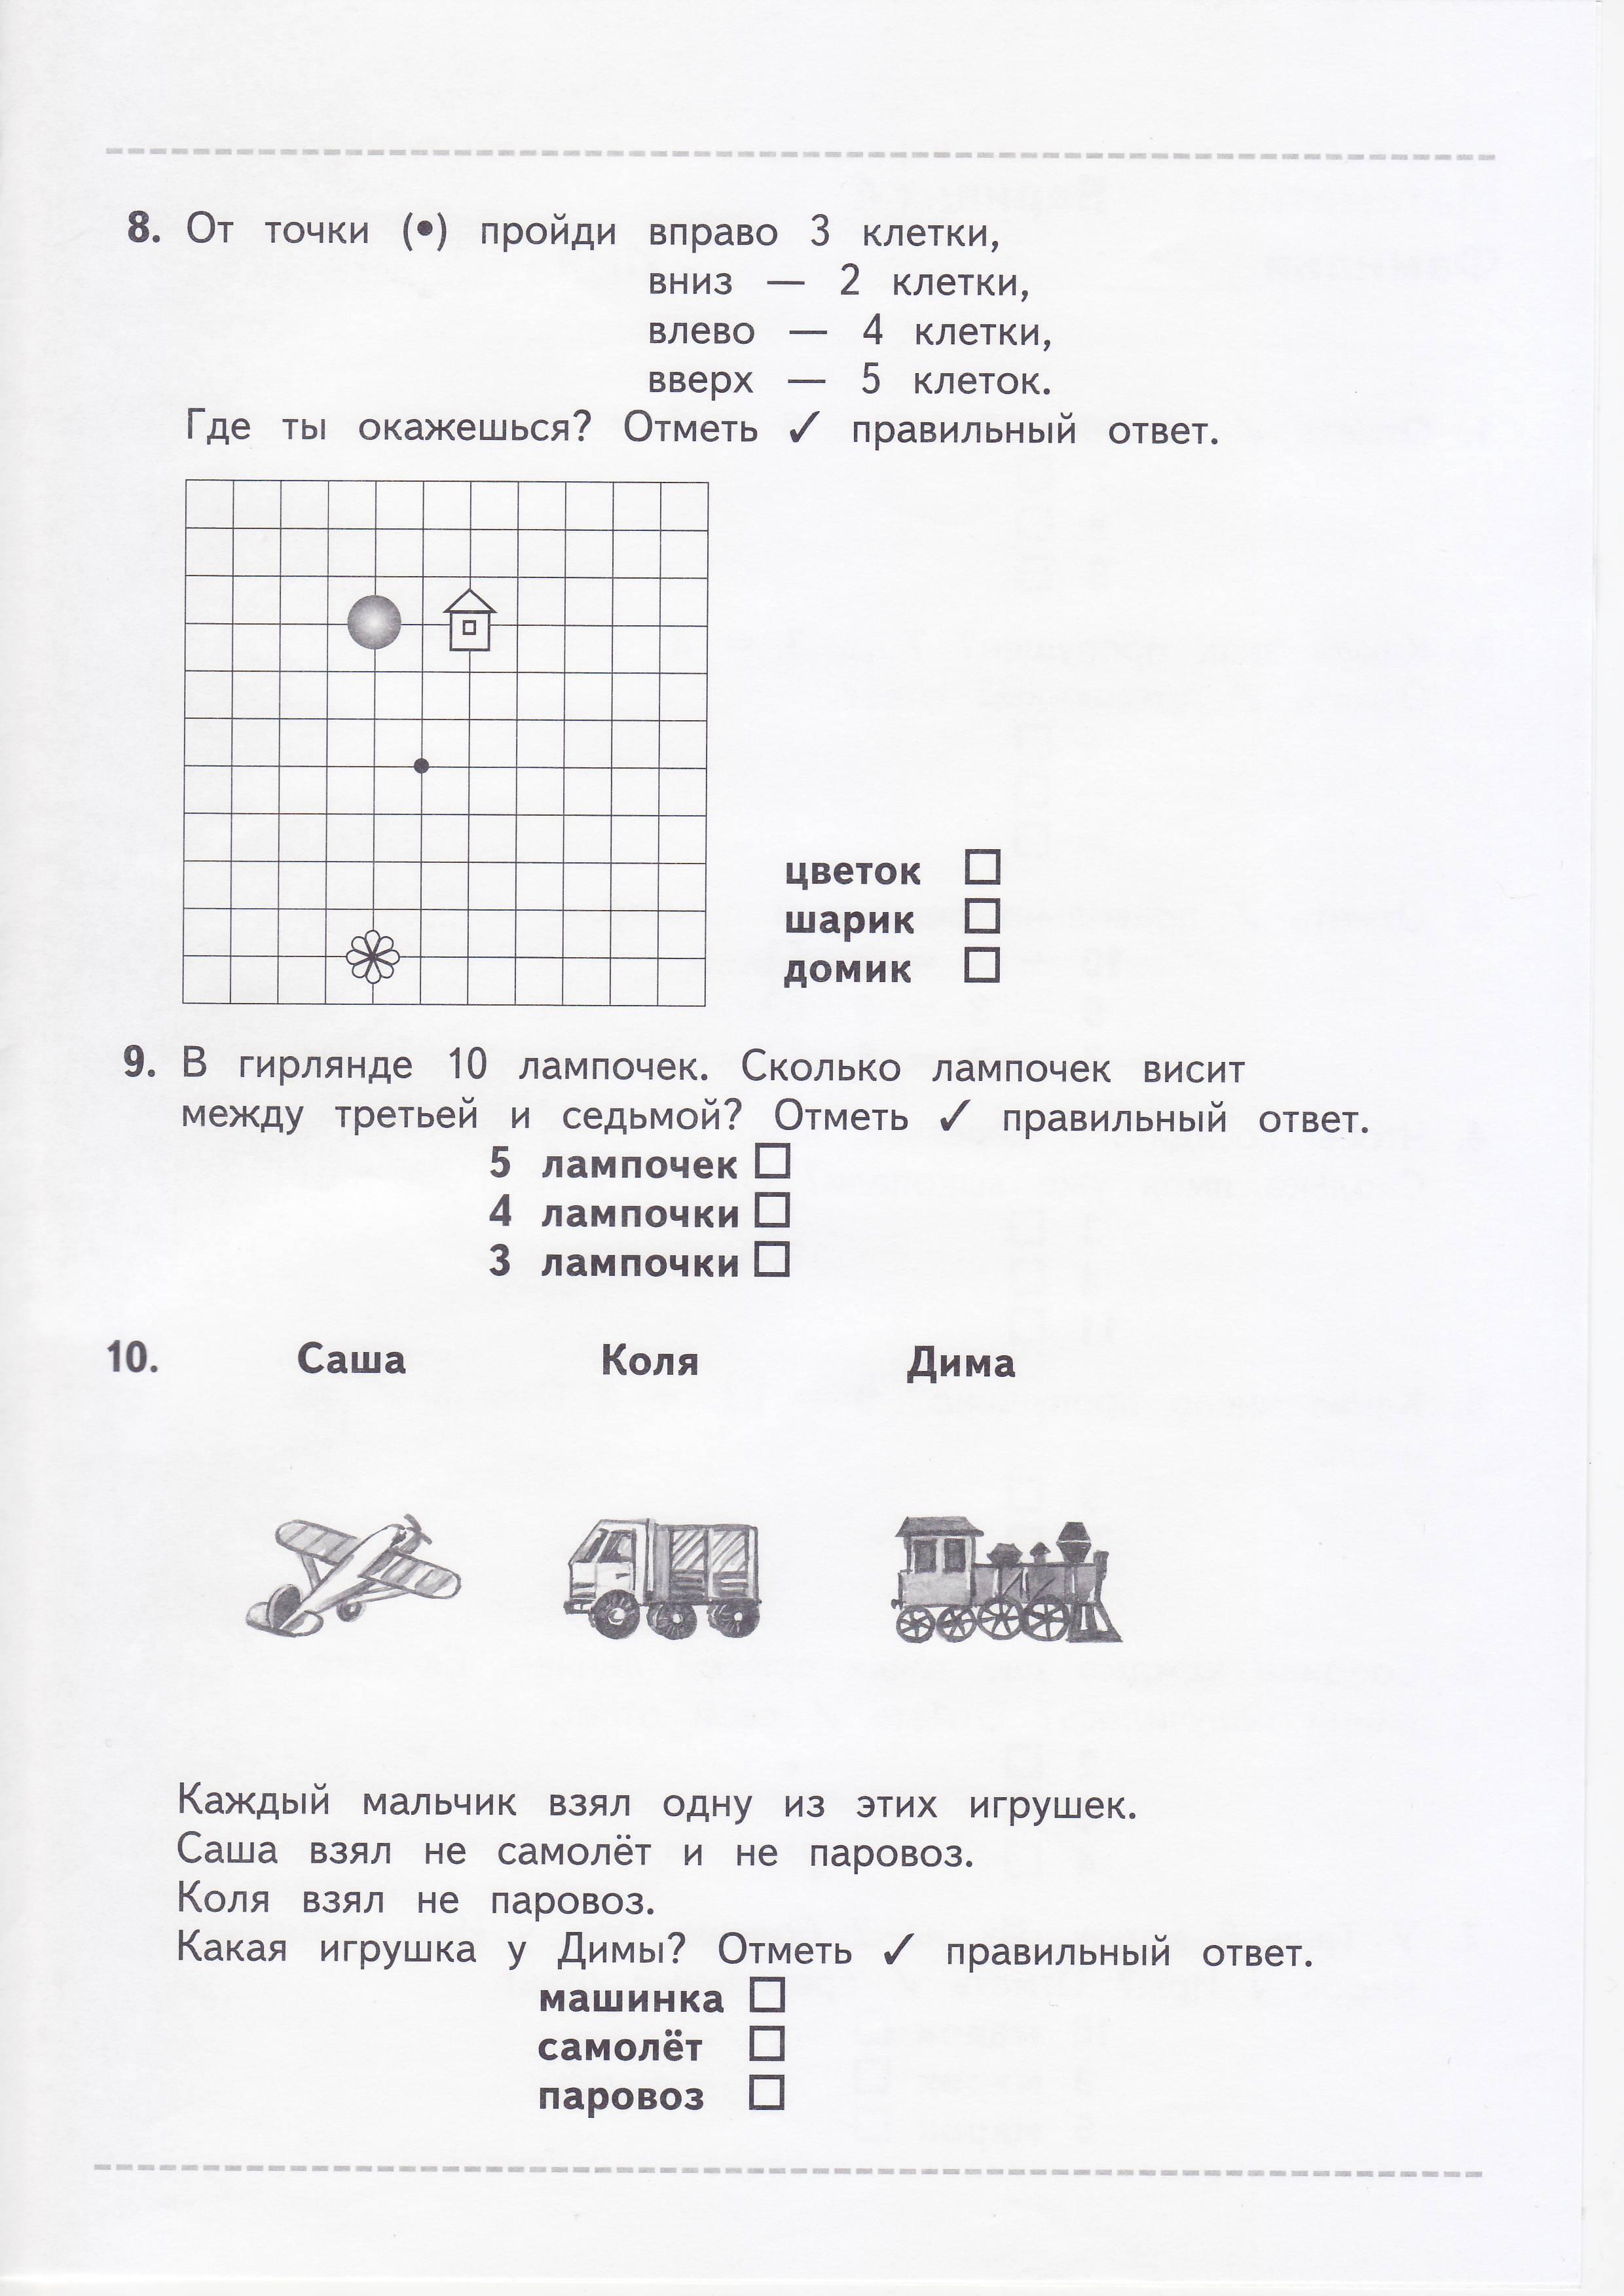 C:\Documents and Settings\Таня\Рабочий стол\2015-09-29\Image0021.JPG